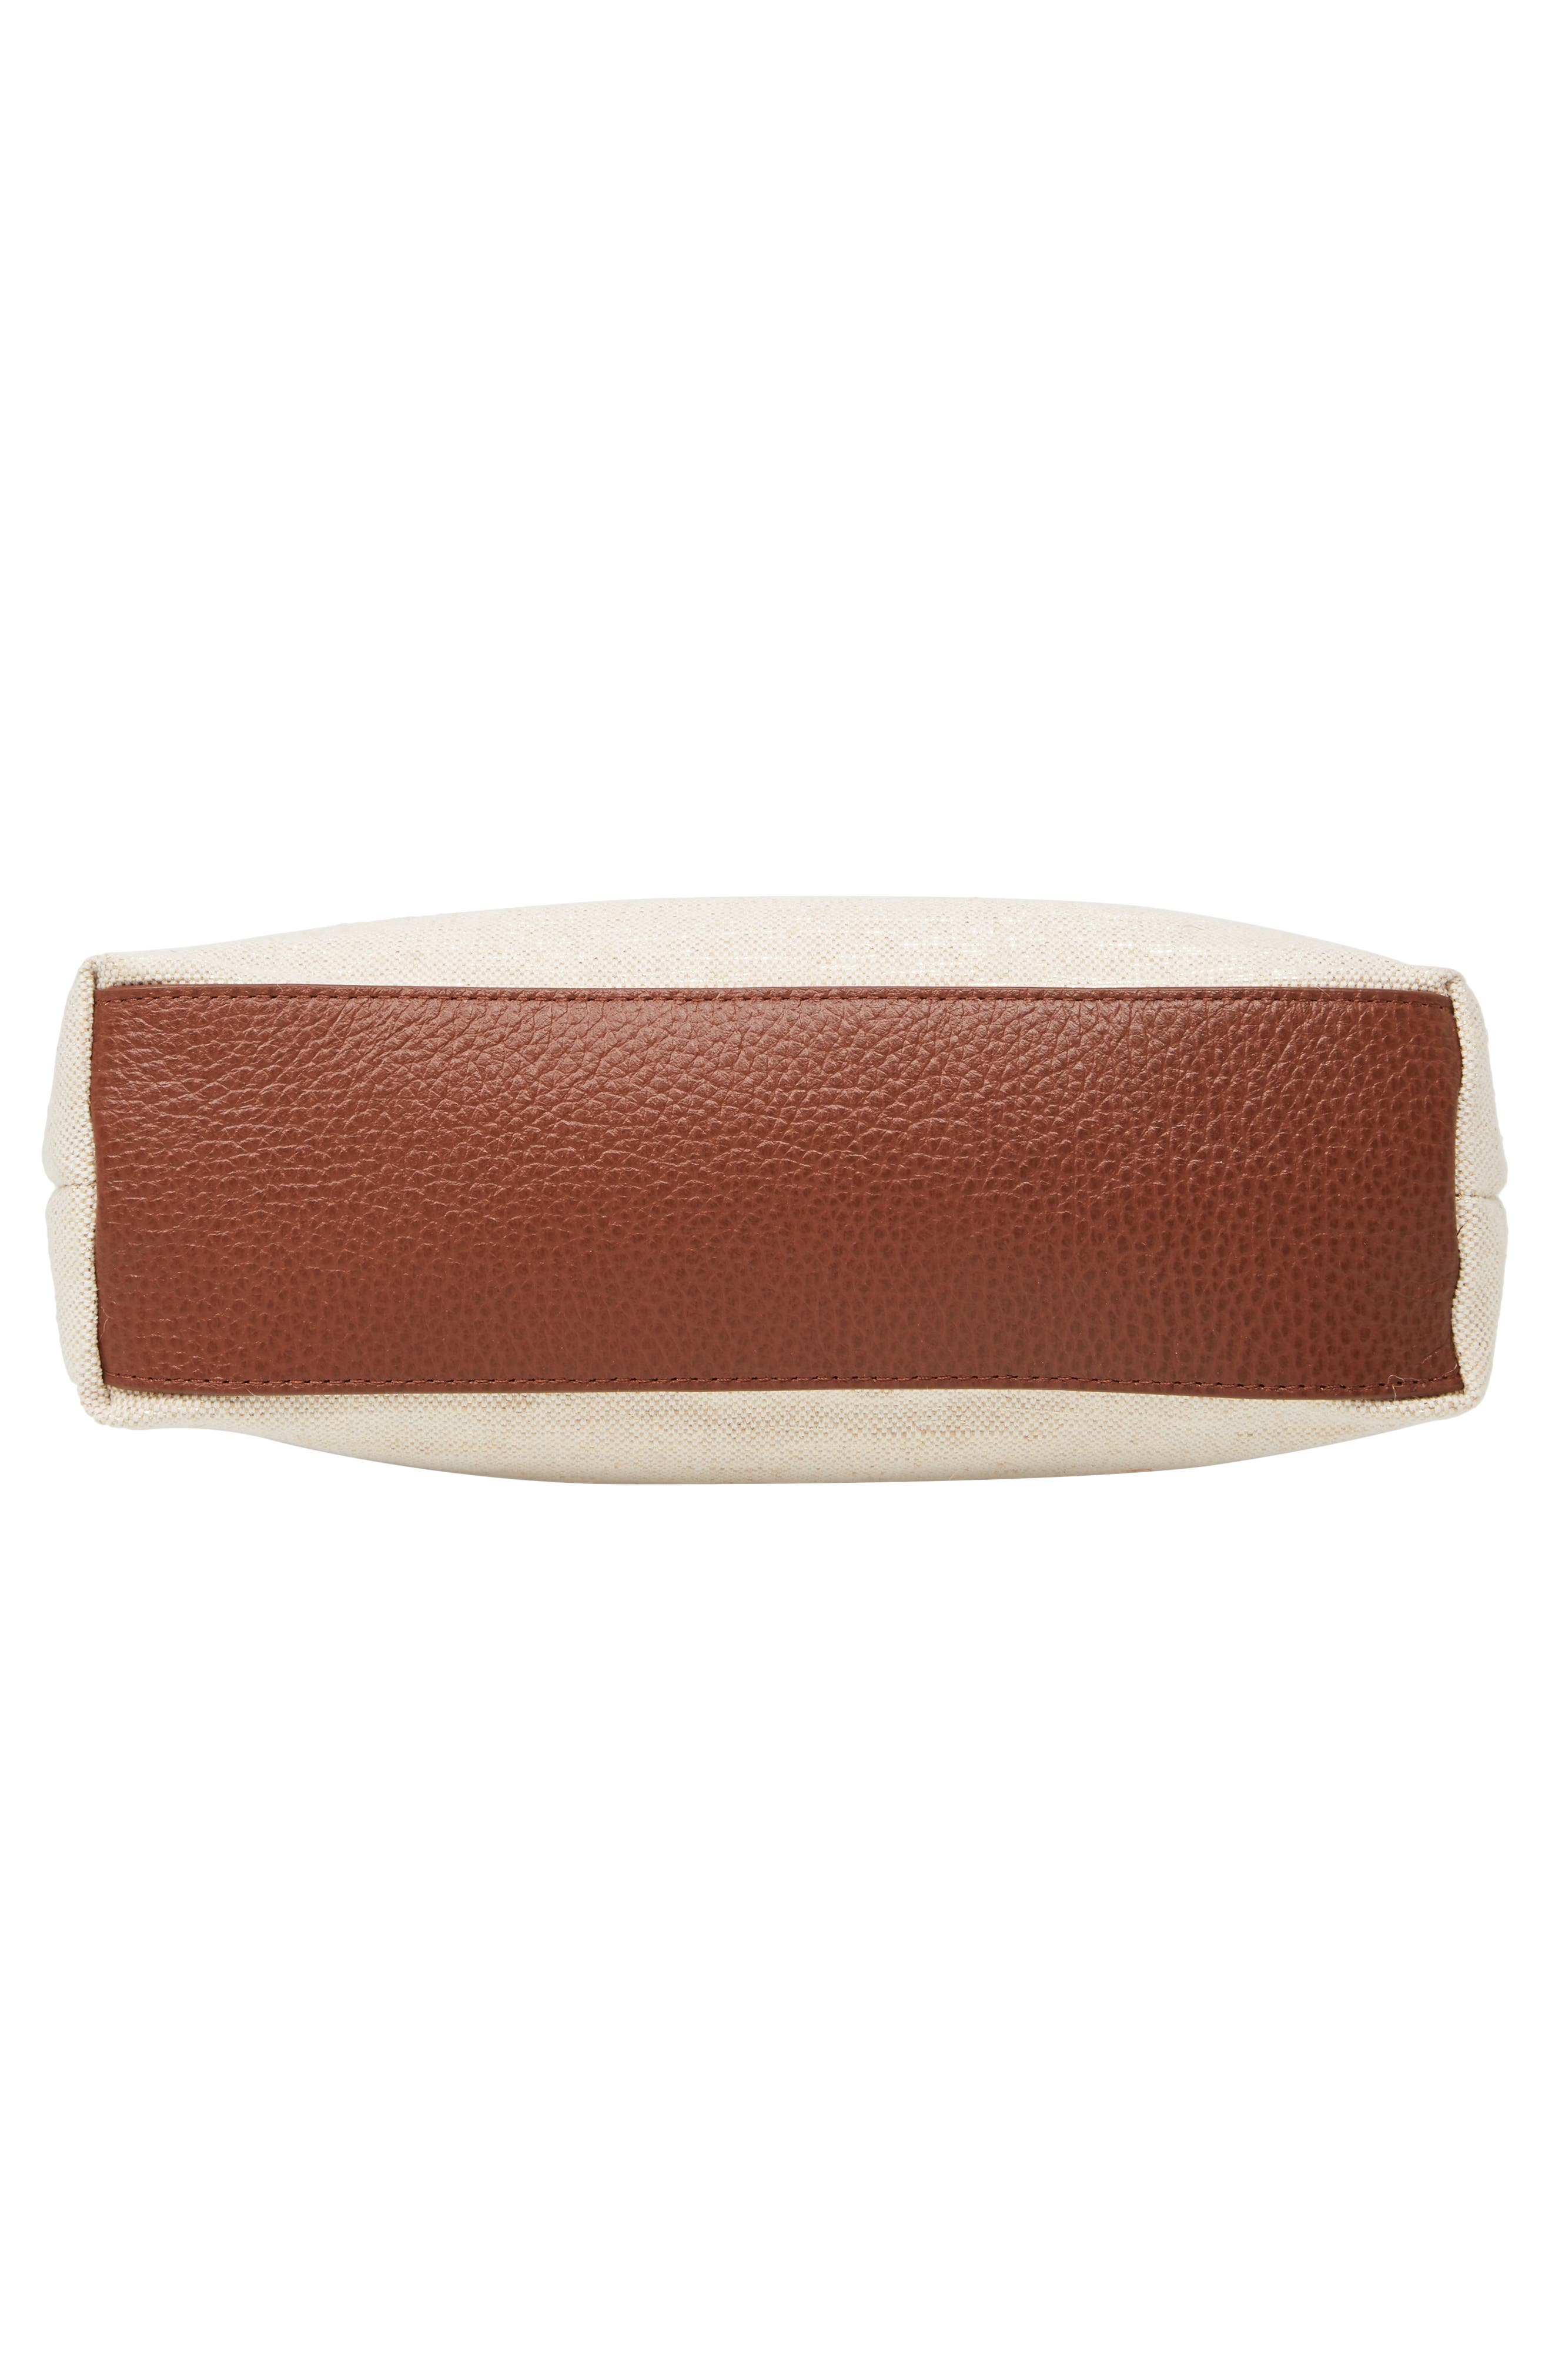 Kaison Linen & Leather Crossbody Bag,                             Alternate thumbnail 6, color,                             NATURAL/ GOLD